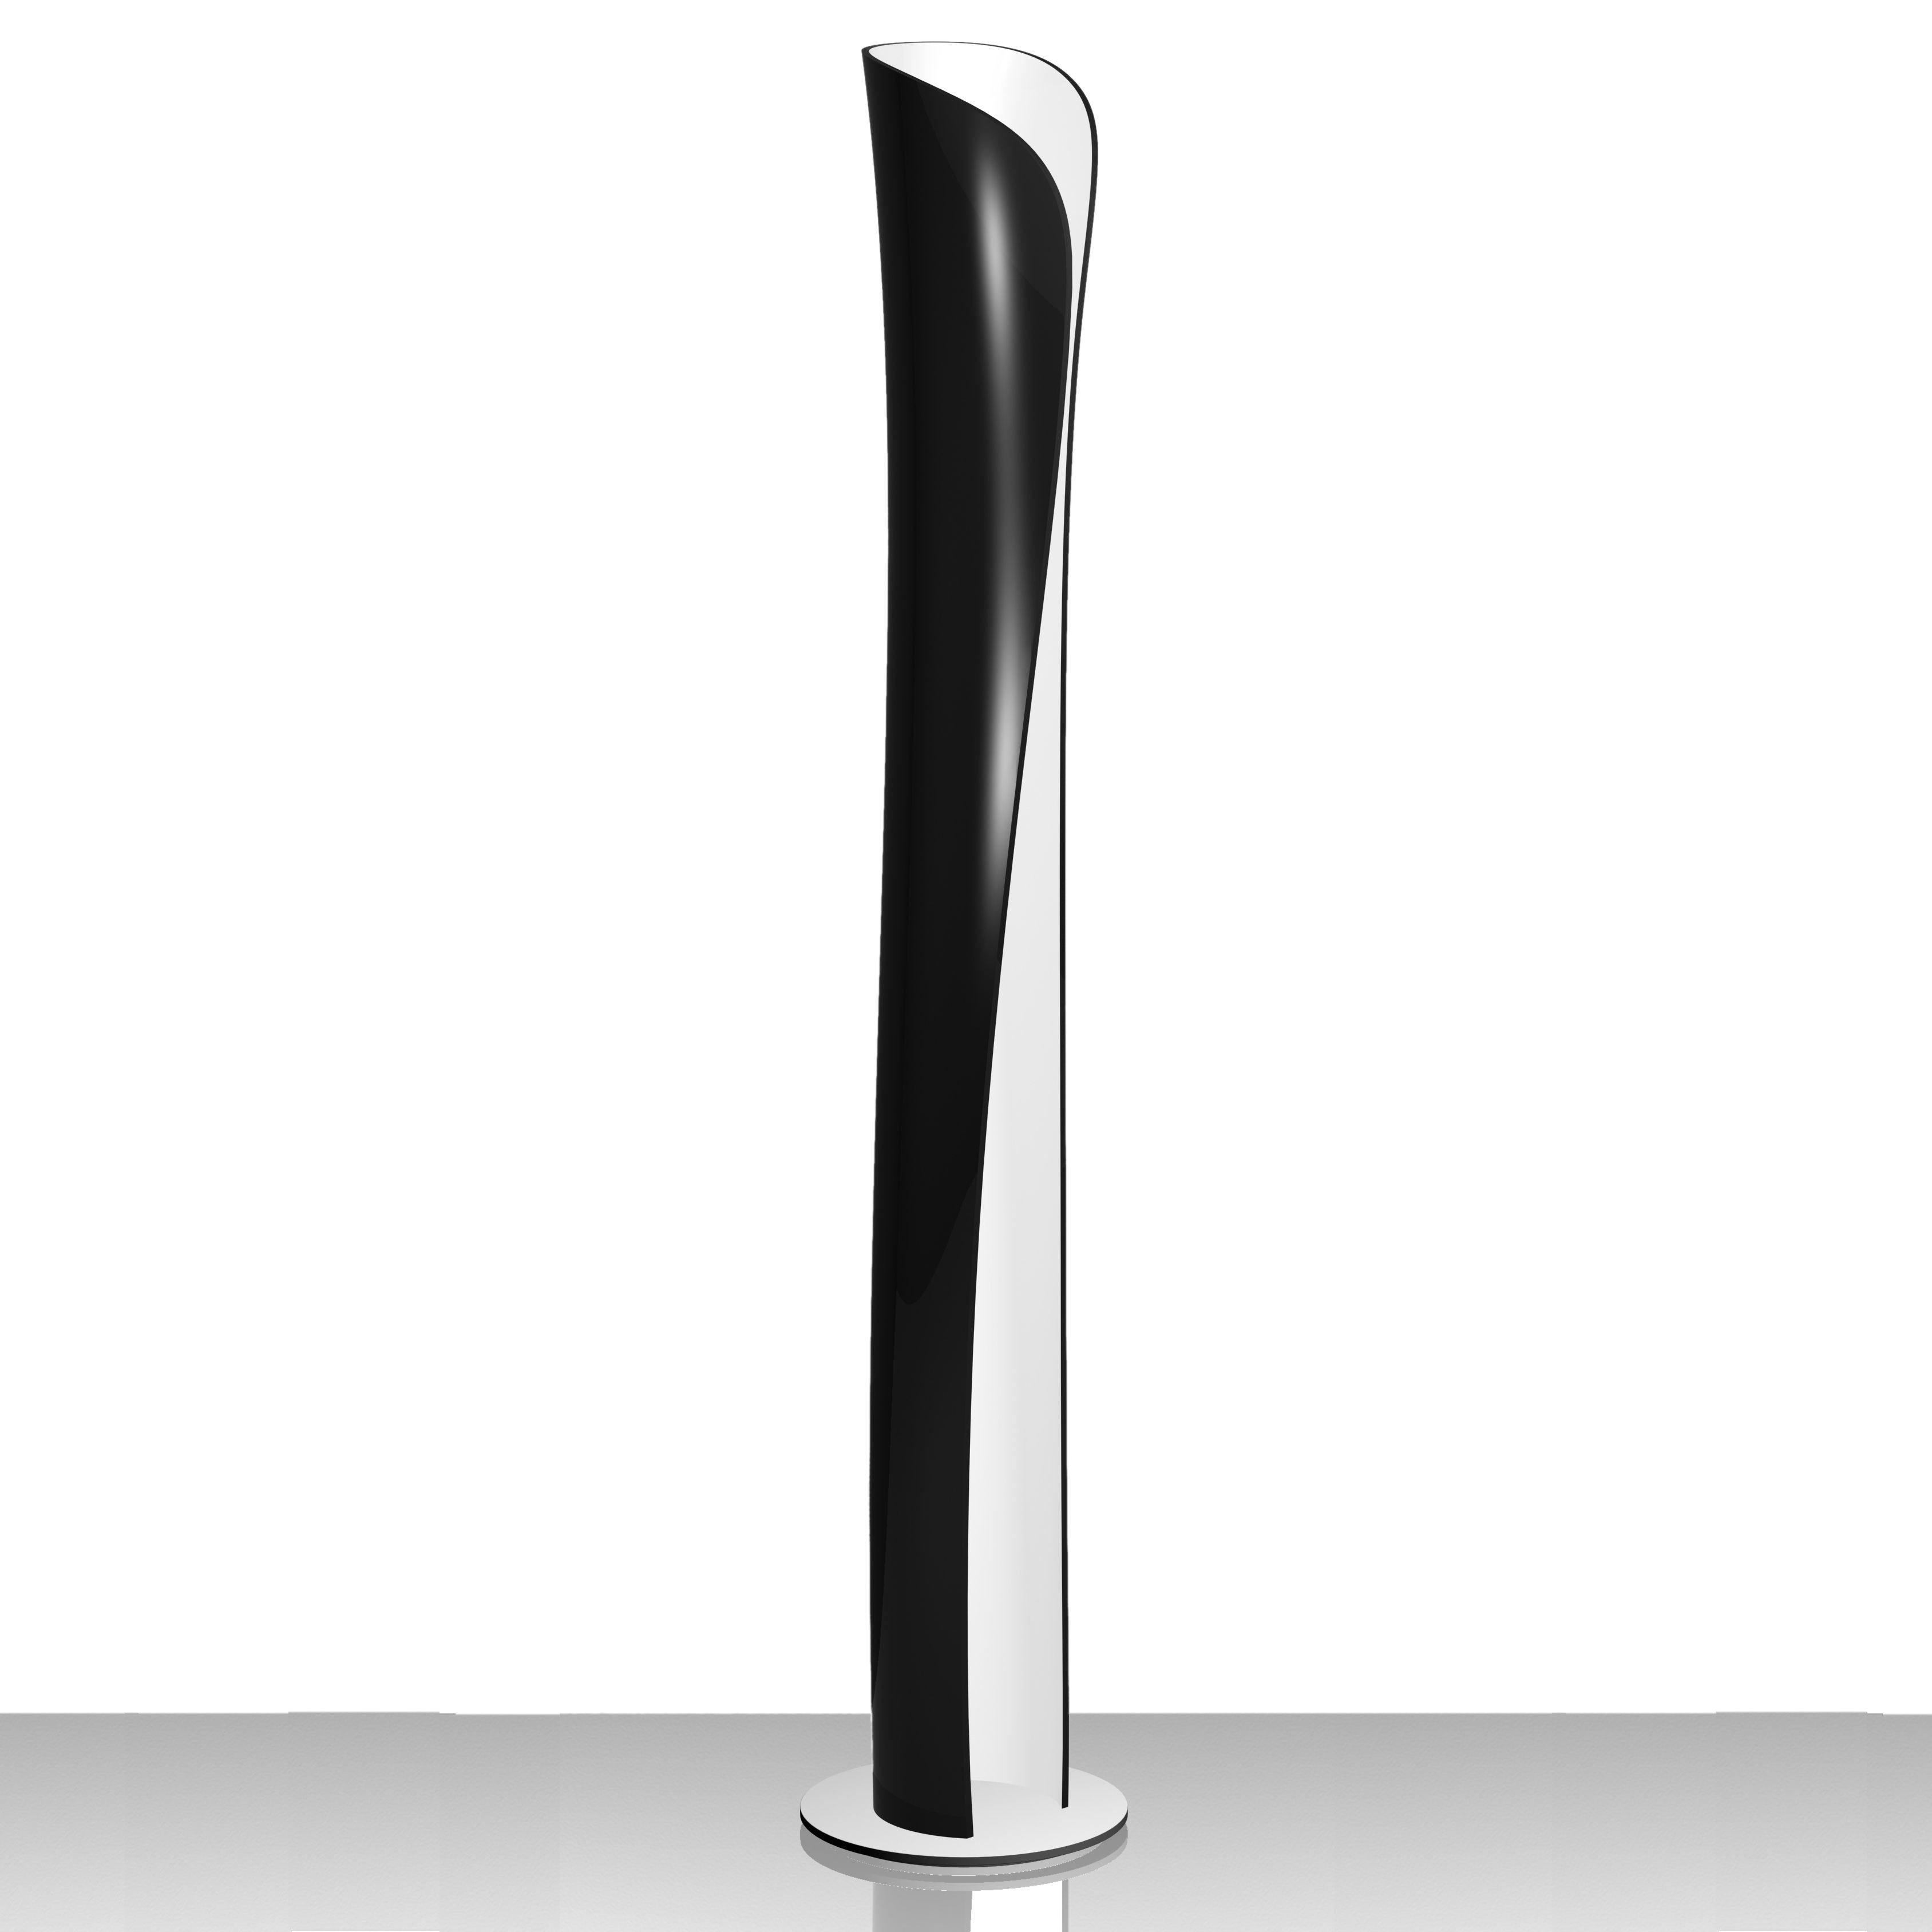 Nero esterno / Bianco Interno - +465,72US$